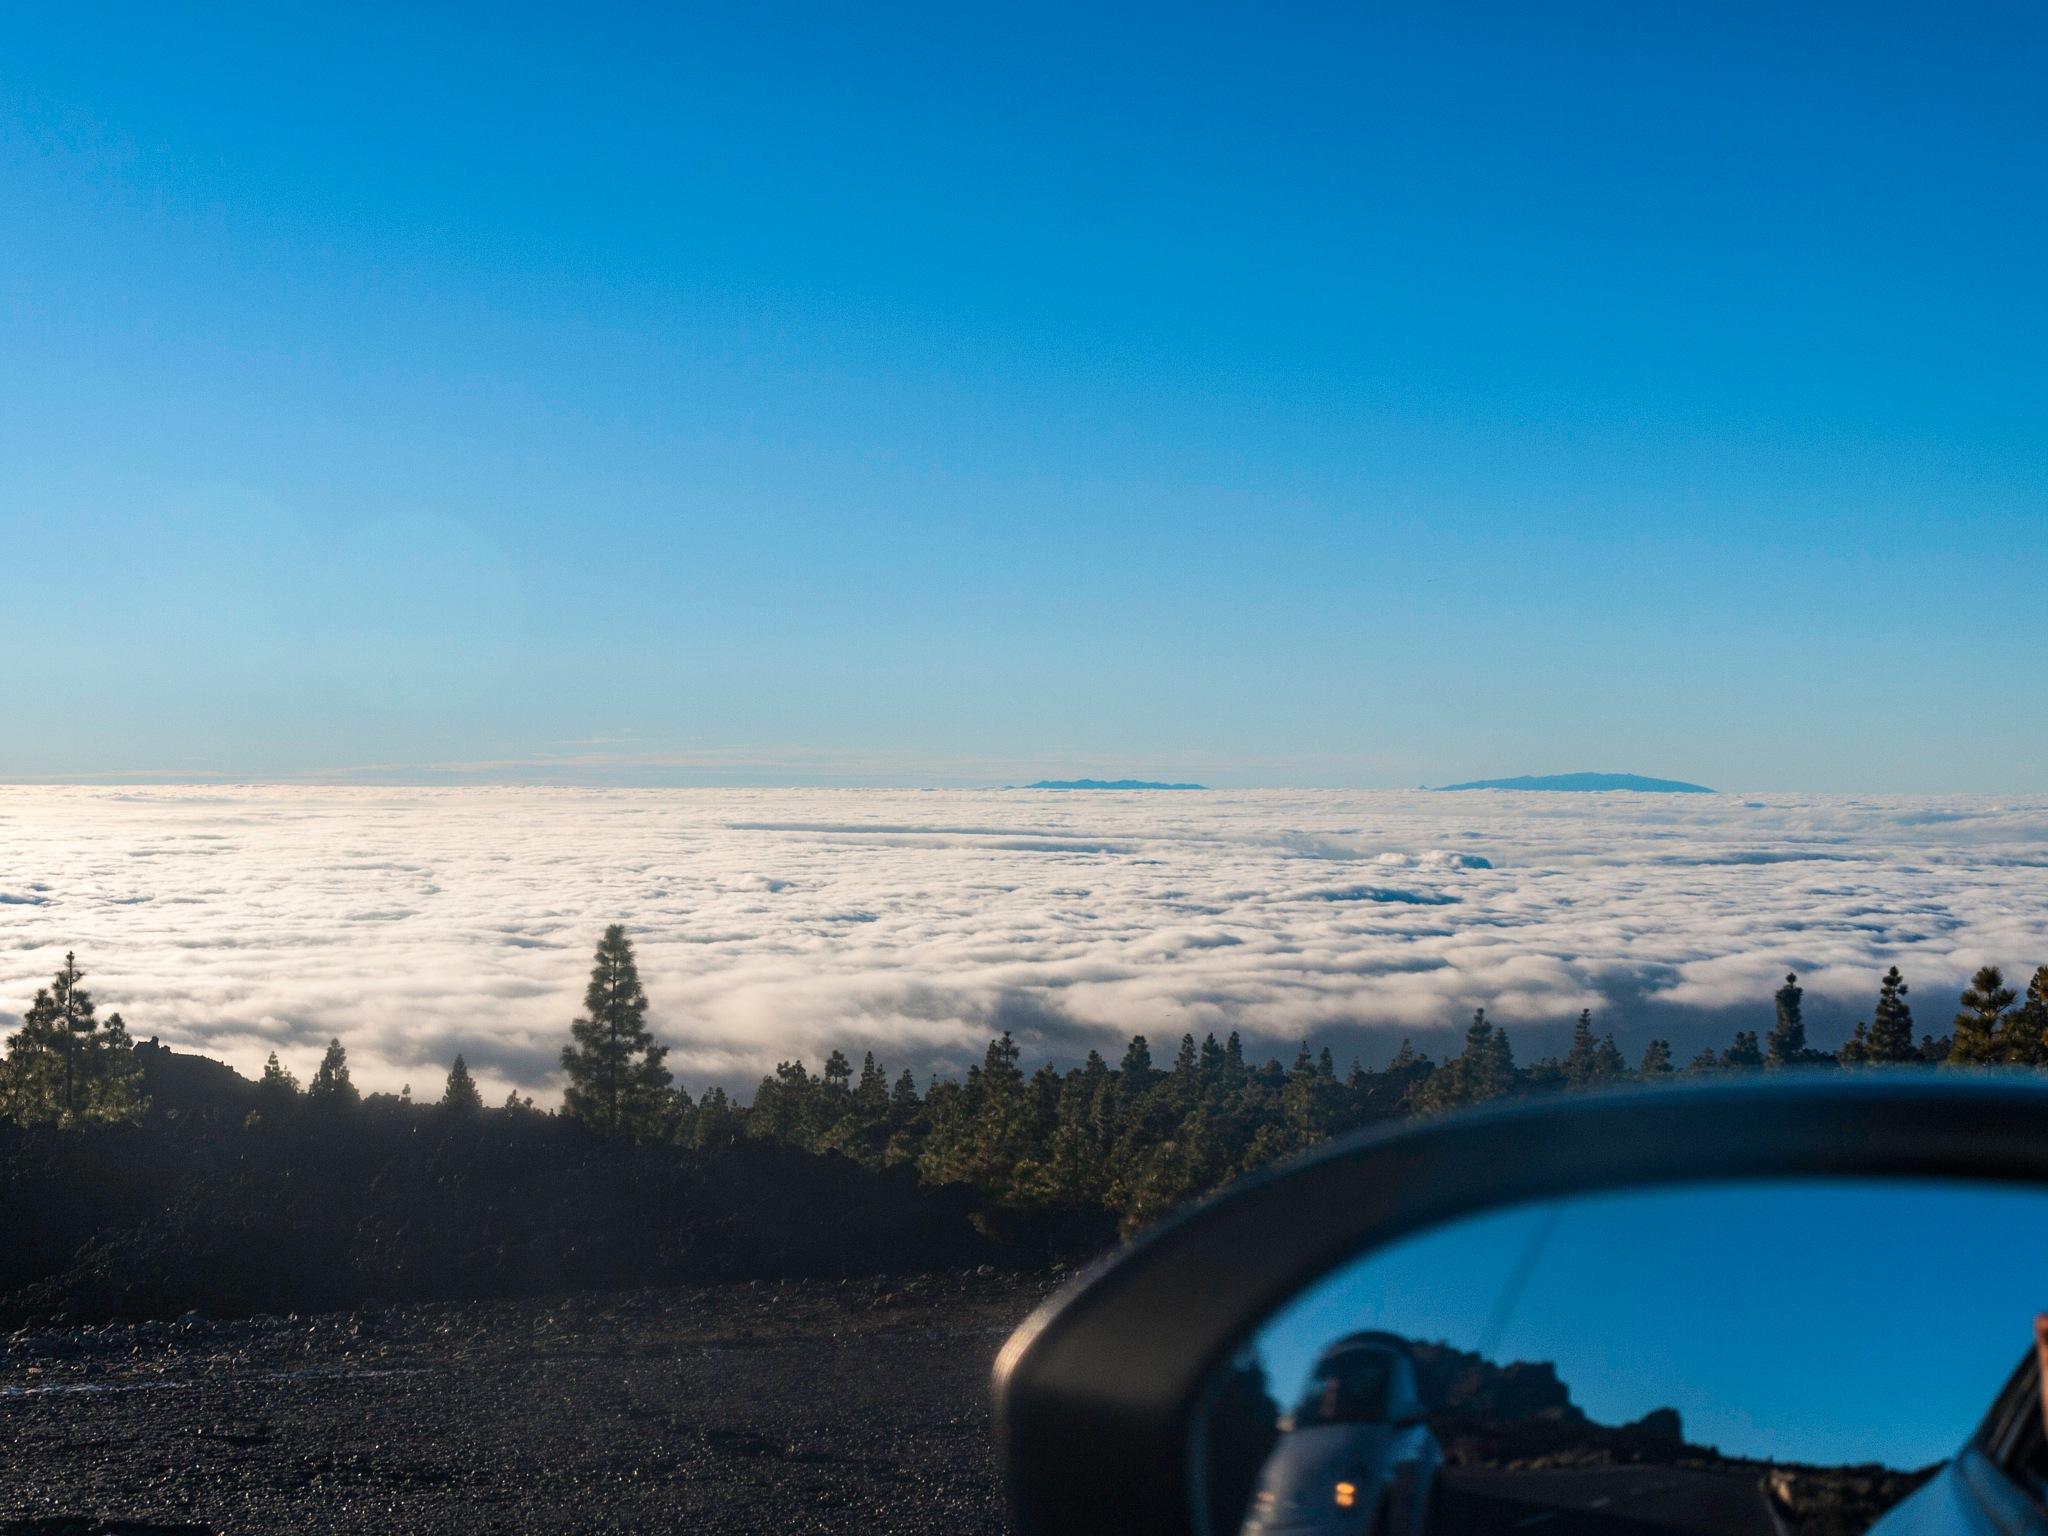 on the clouds...sobre las nubes by Rodolfo Jose Acosta